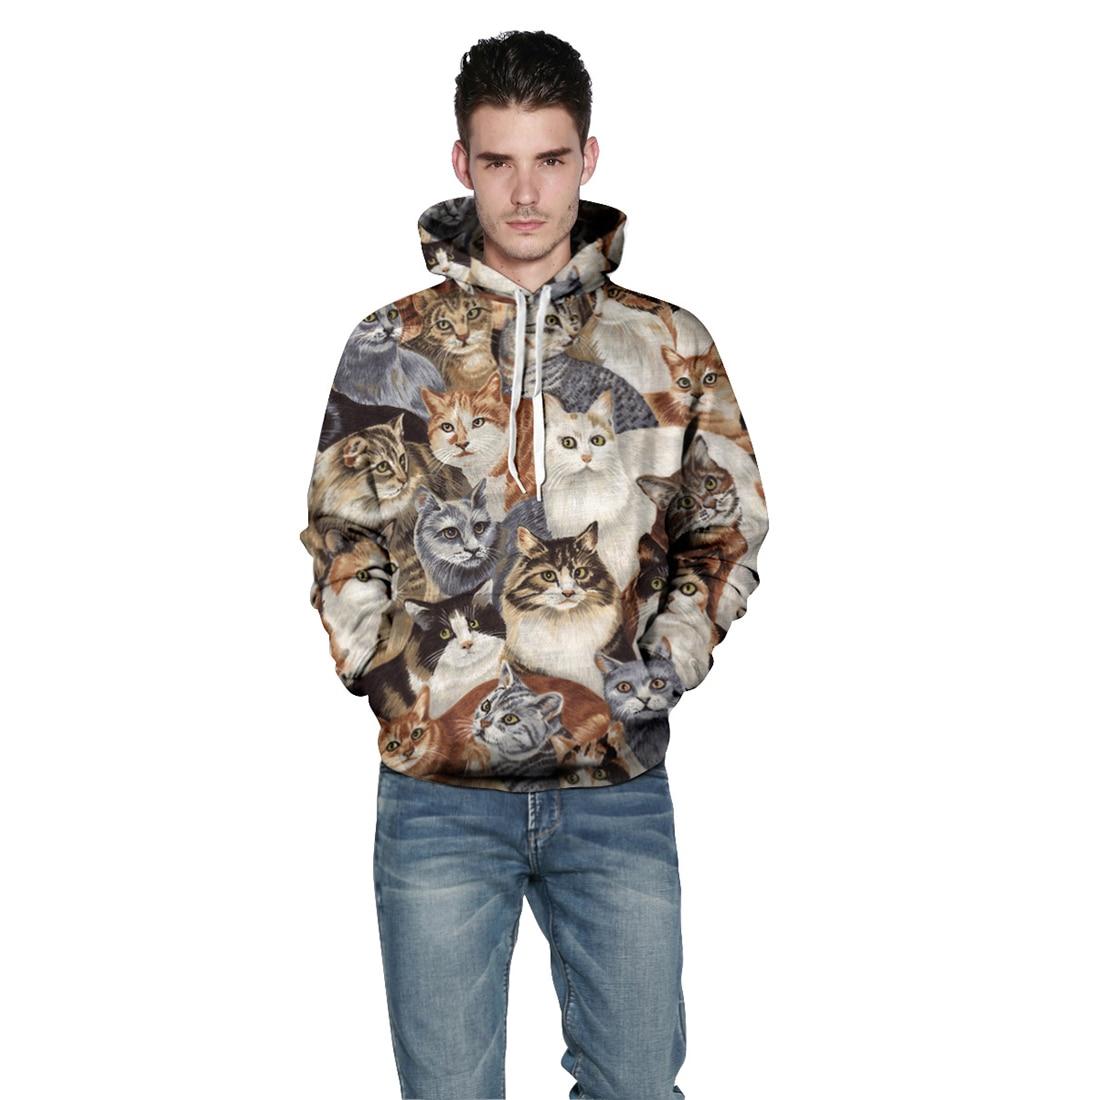 Men/Women New Fashion Cap Hoodies Sweatshirts Casual 3d Cats Print Hoodies Hooded lovely Tracksuit Hoody